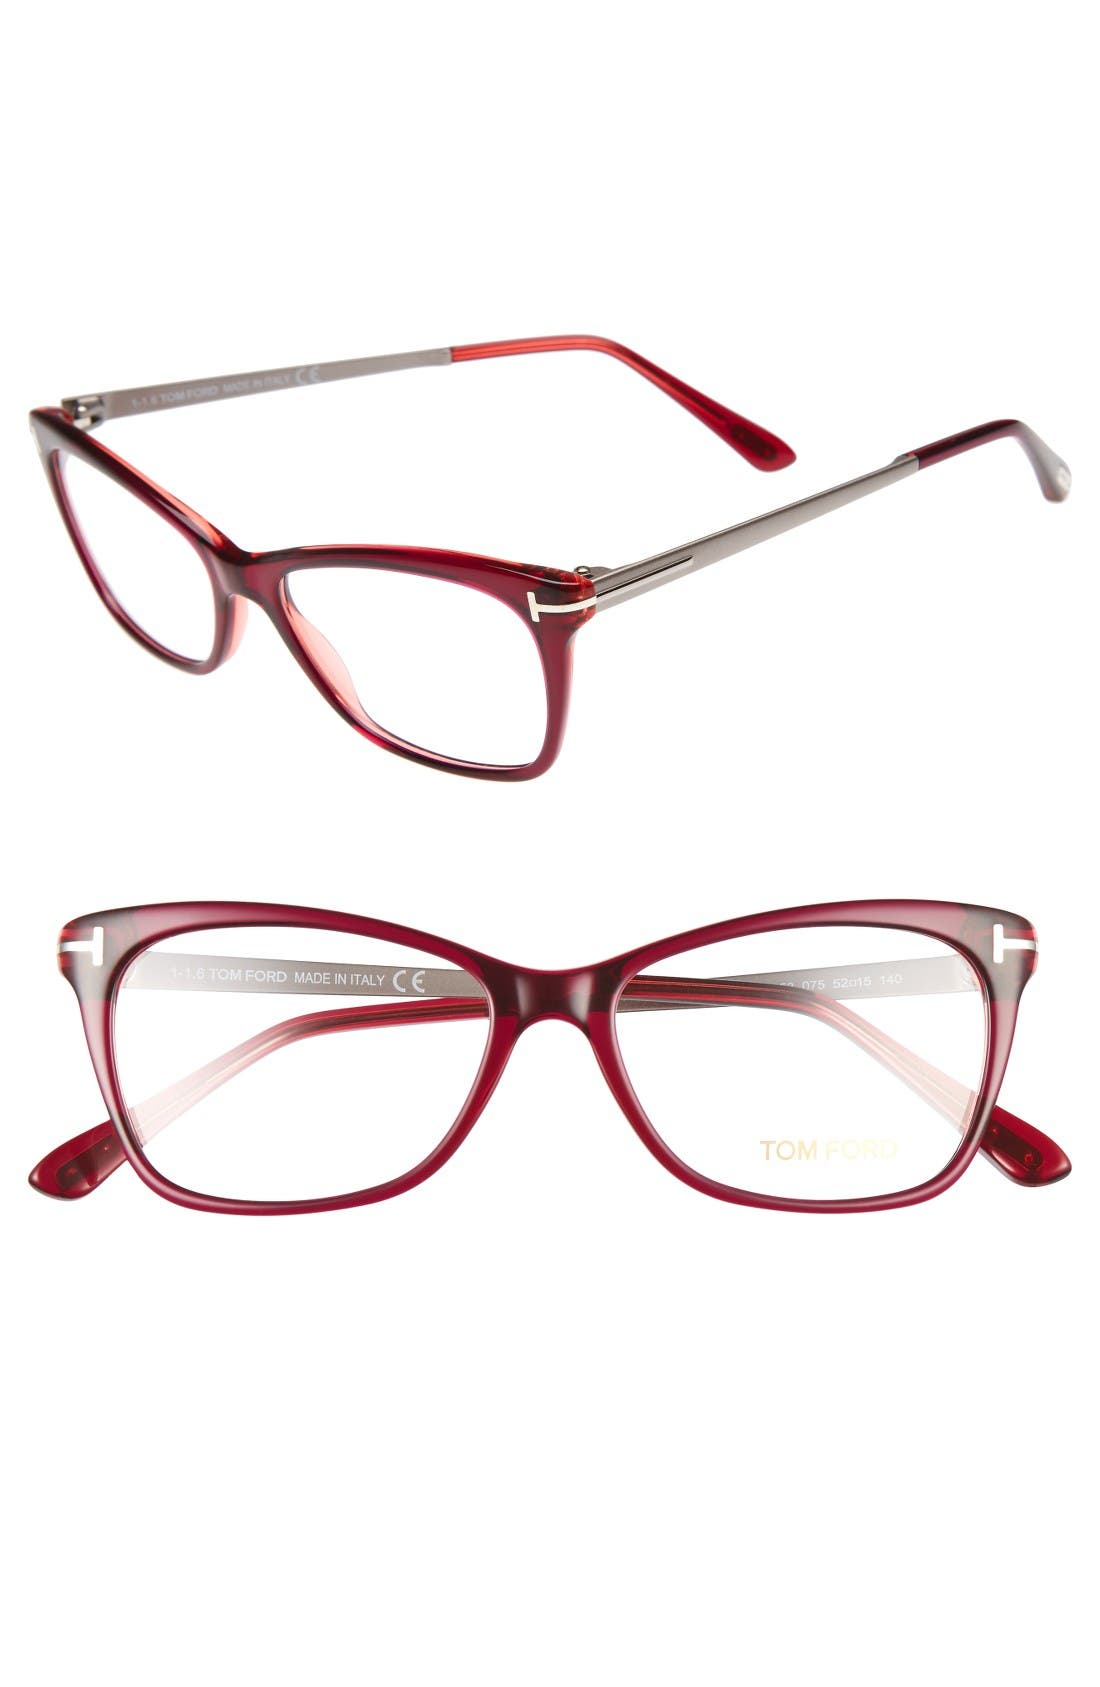 Tom Ford 52mm Cat Eye Optical Glasses